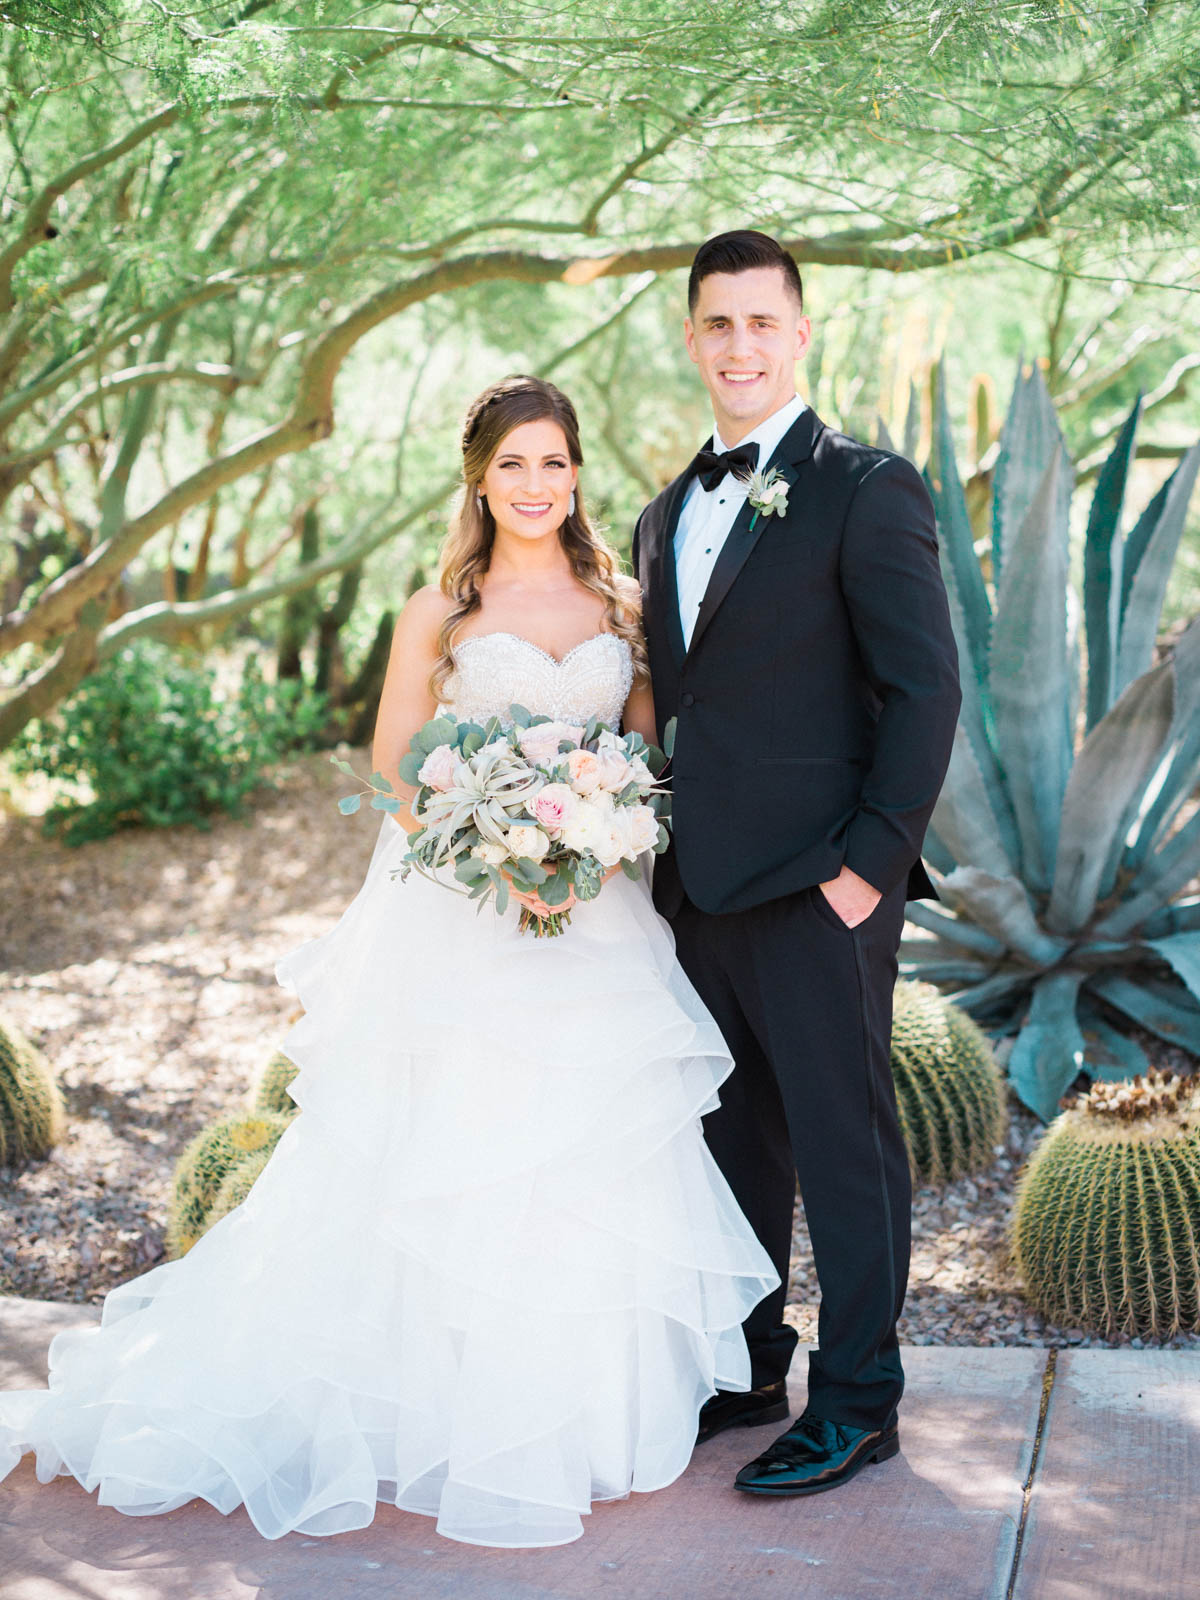 Mike & Jamie's beautiful wedding day captured by Tucson Wedding Photographers Betsy & John